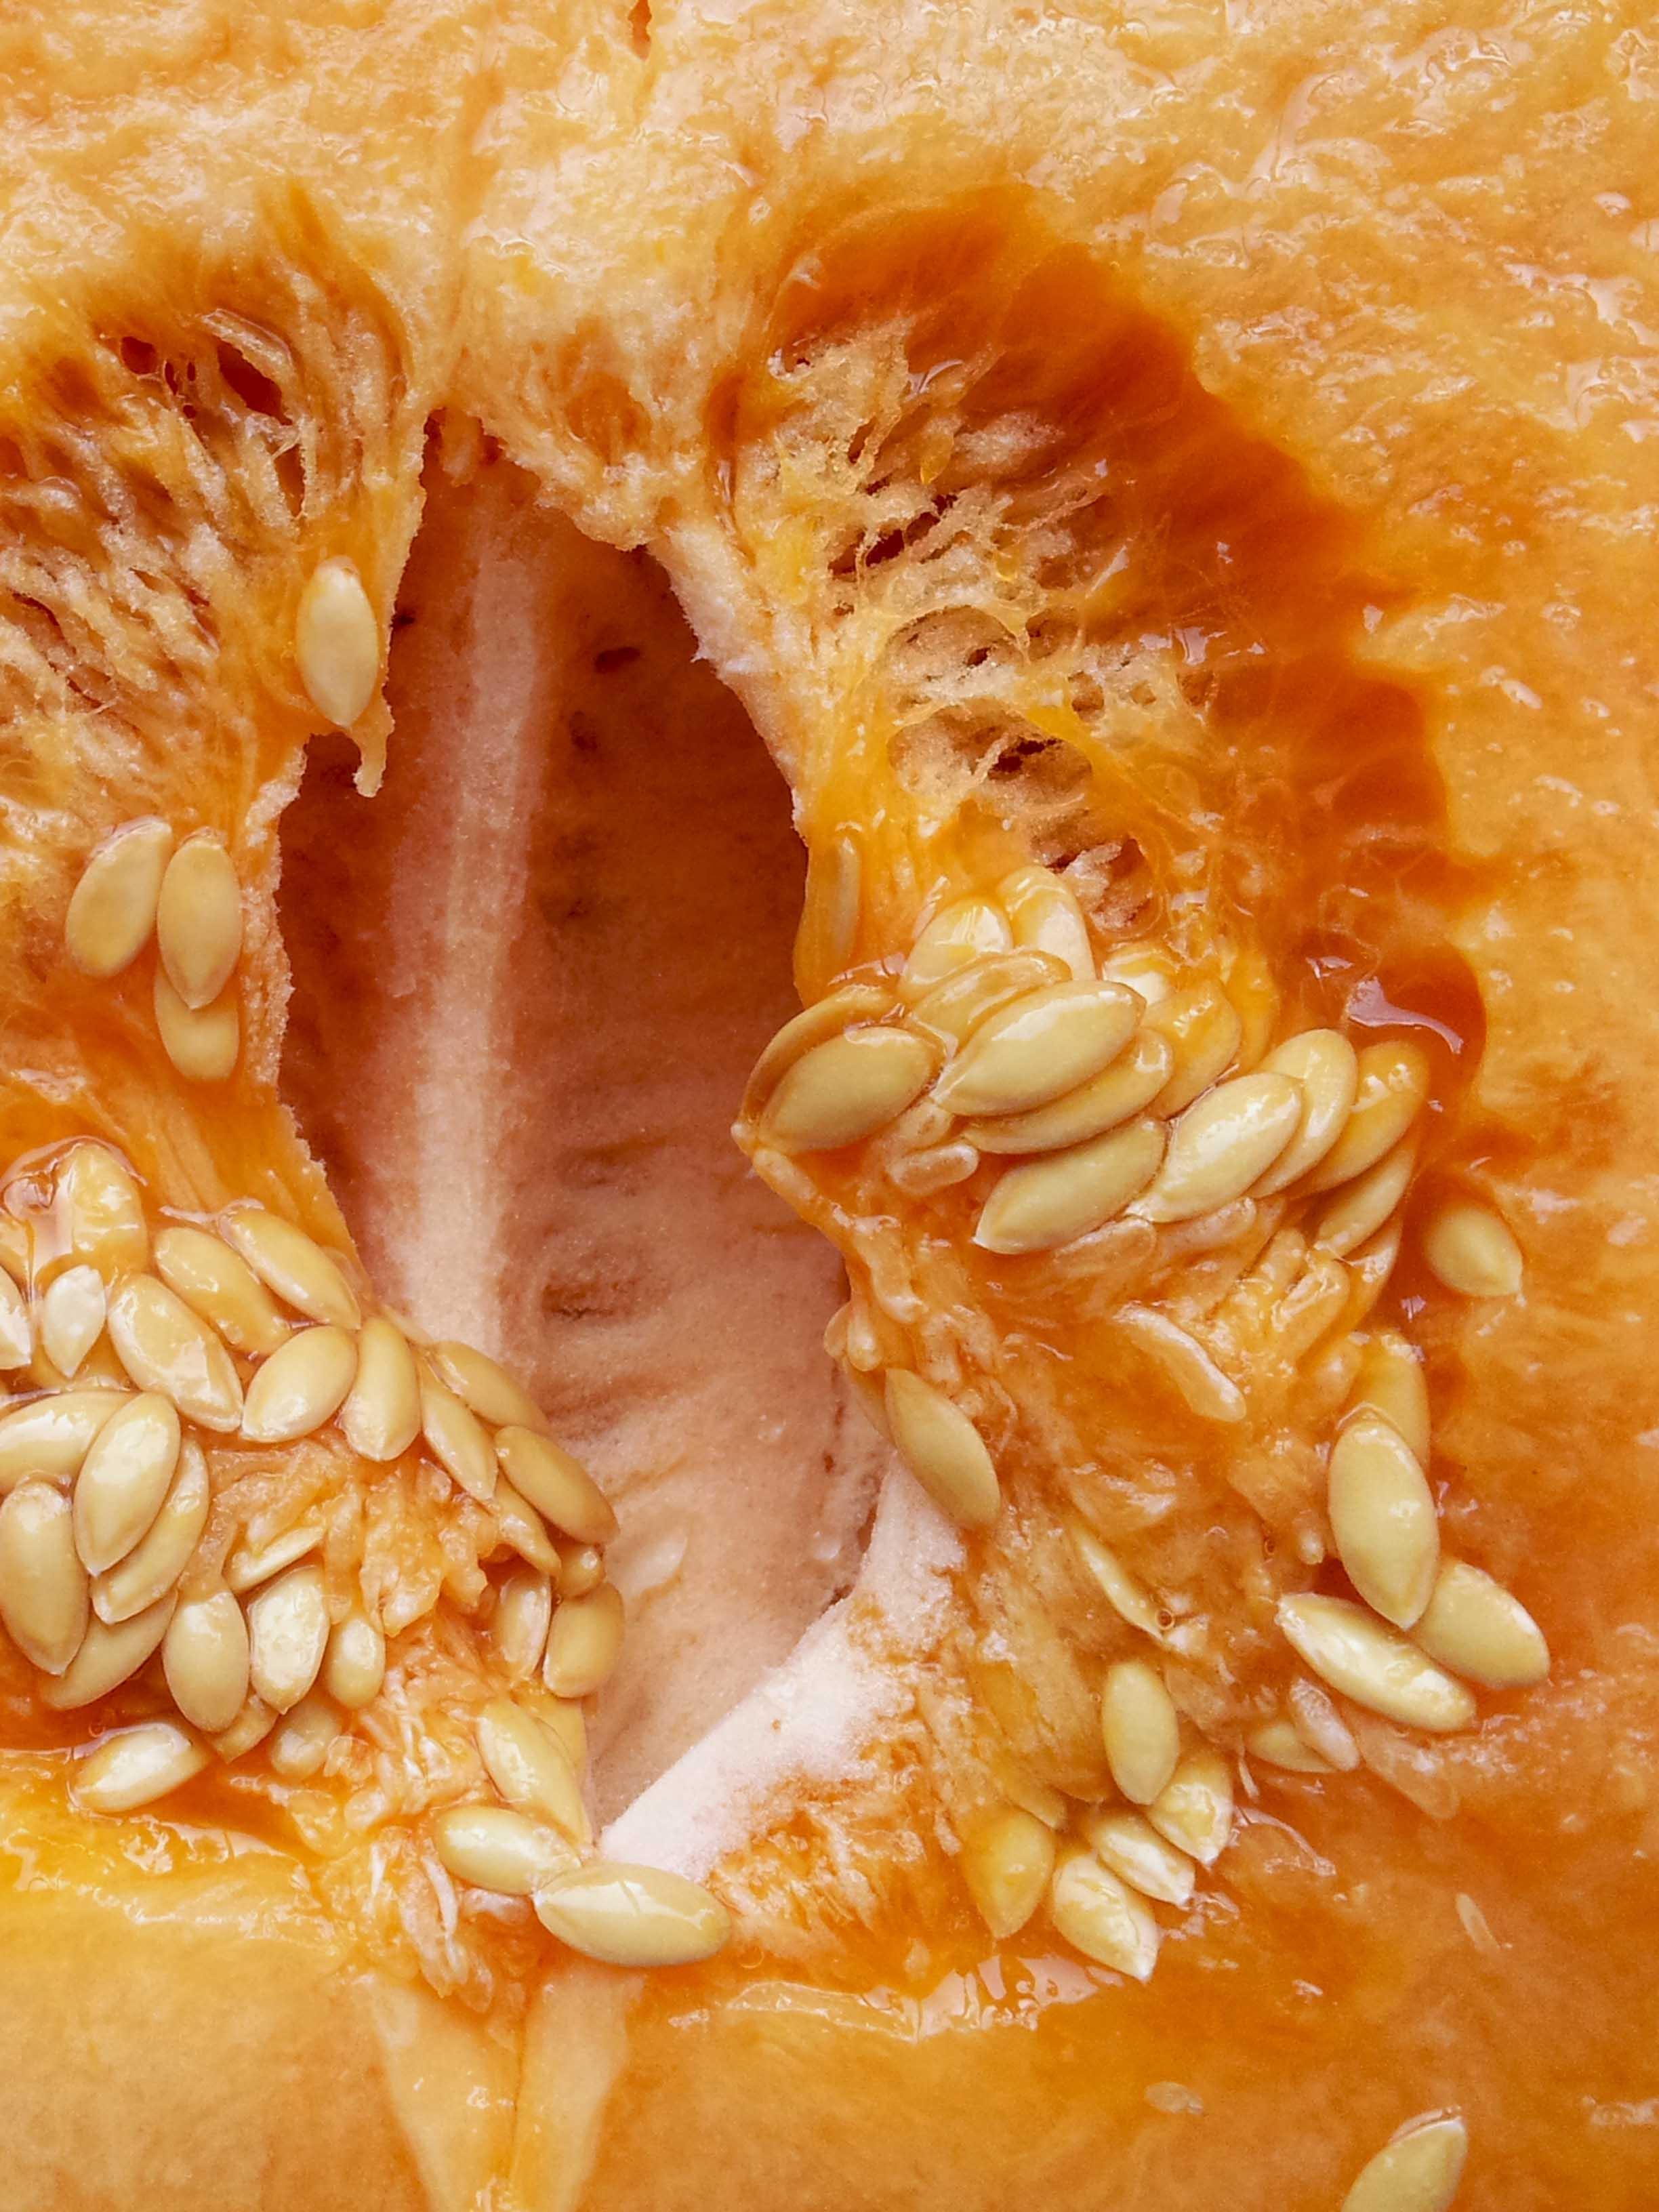 Pineapple_melon.jpg